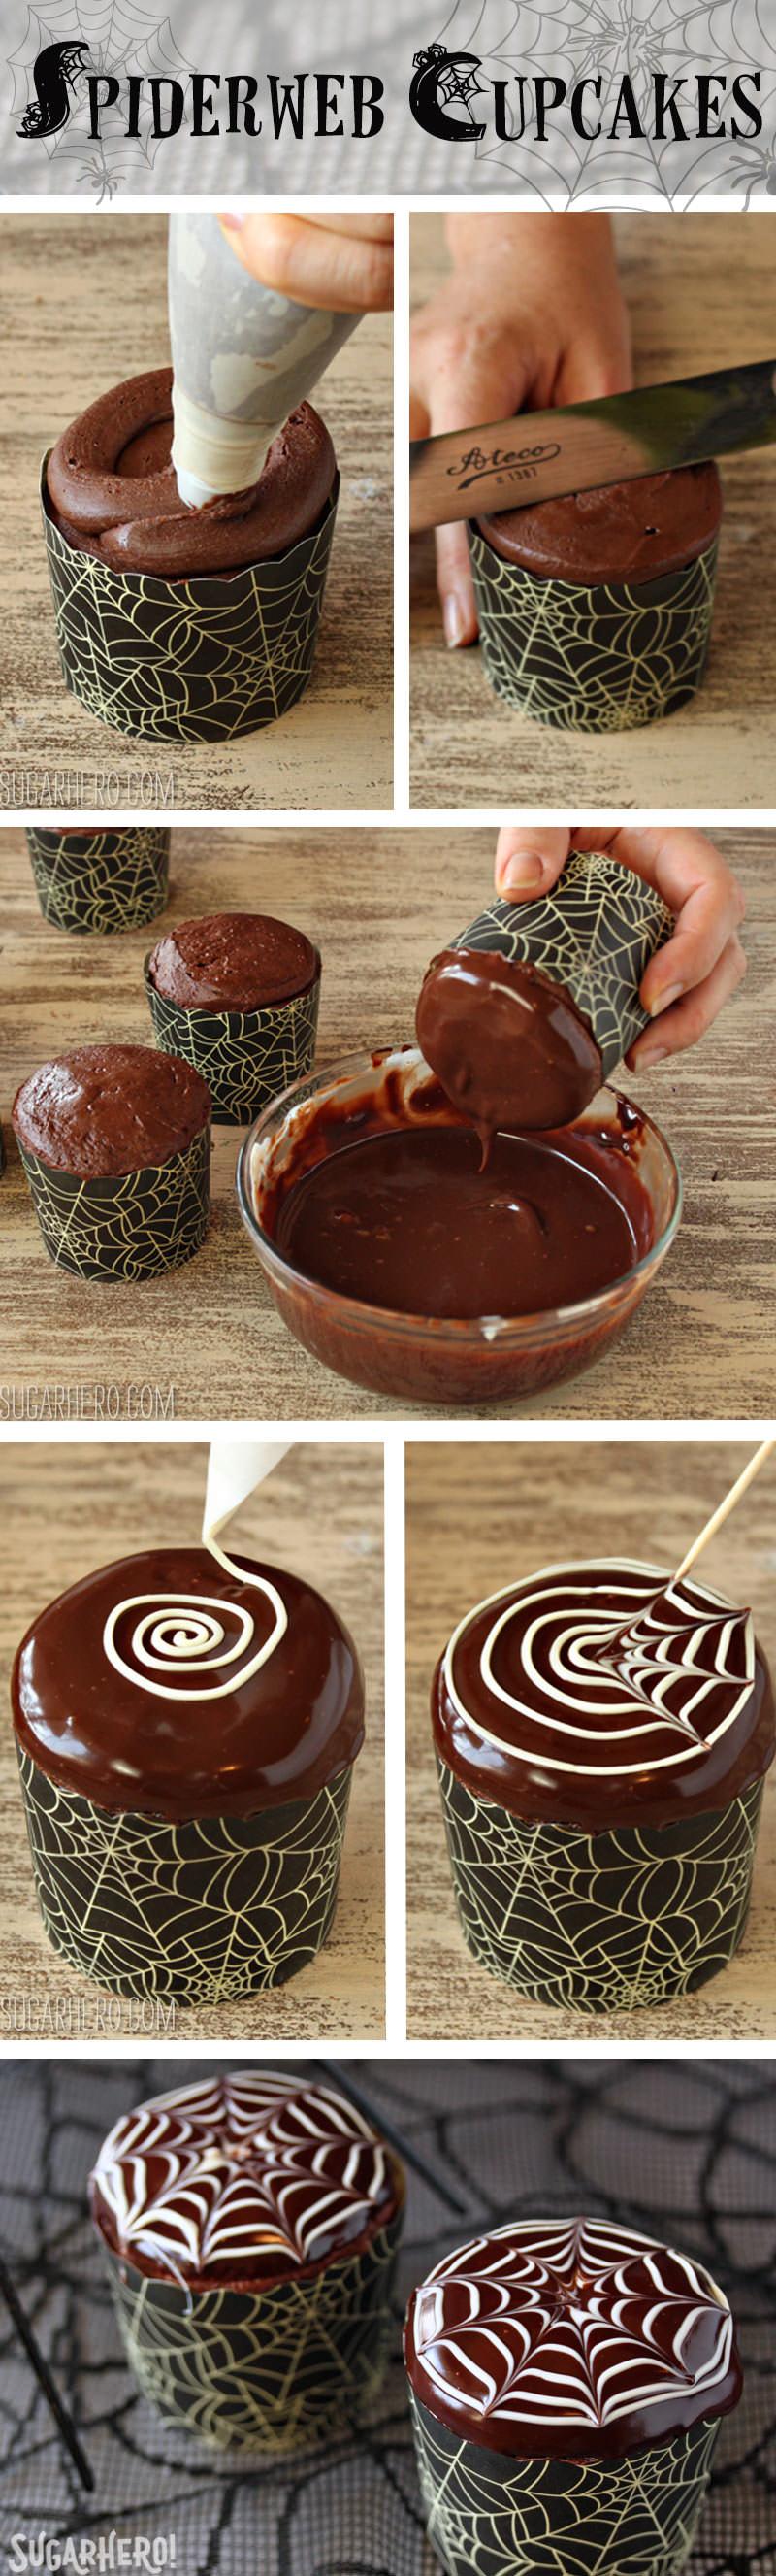 Spiderweb Cupcakes and Chocolate Spiders Recipe   From SugarHero.com